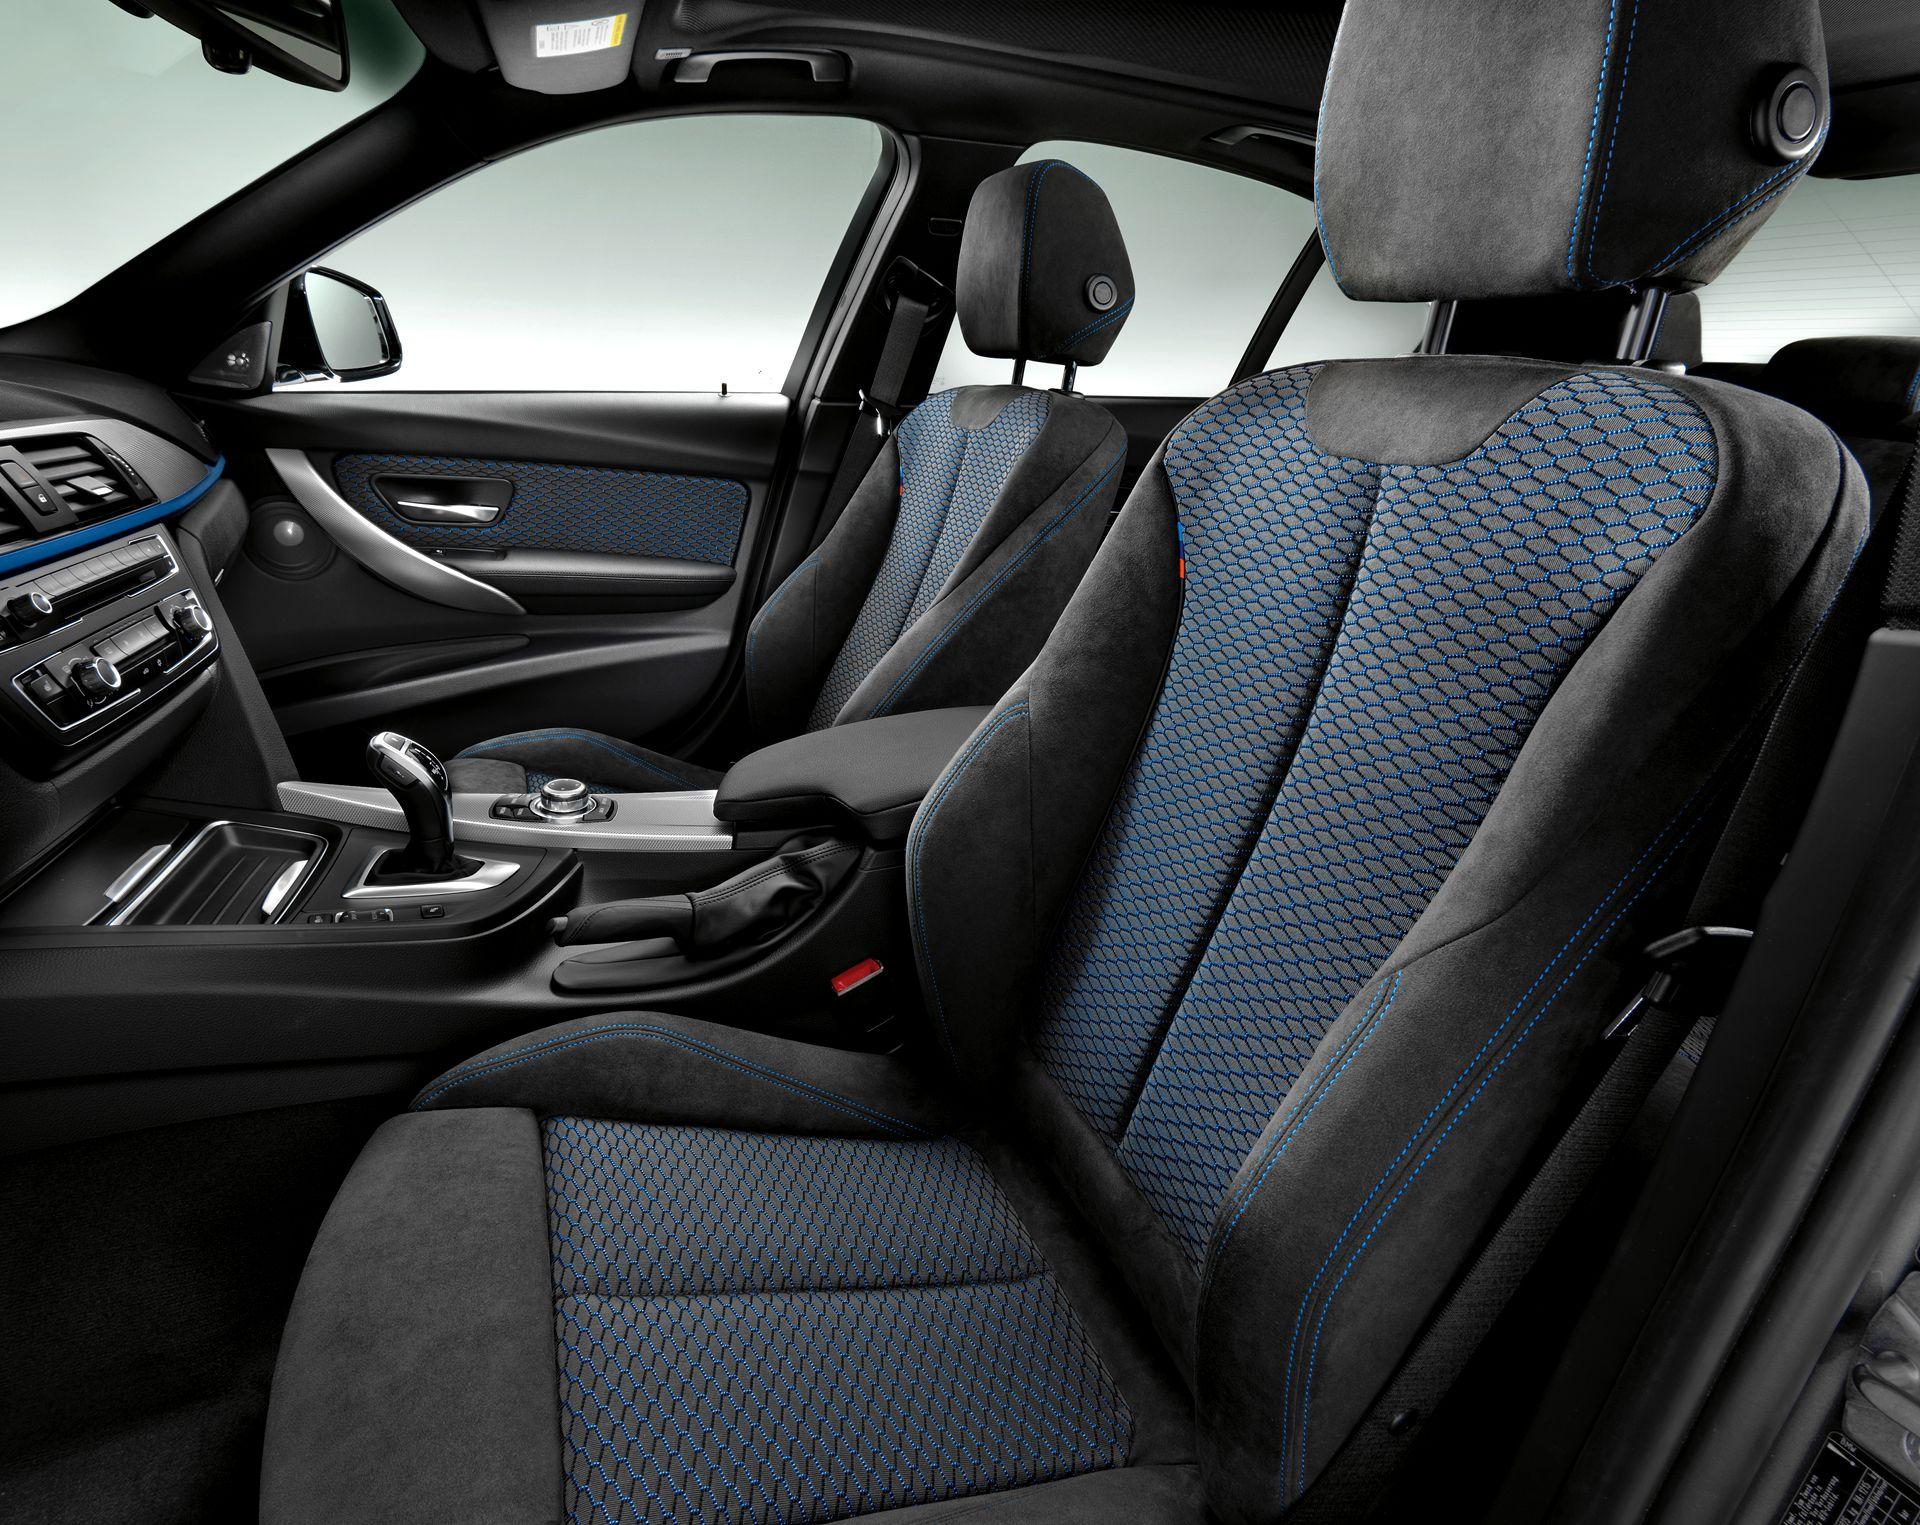 Interior Of Bmw S 2013 335i M Sport Edition Love The Cloth Seats